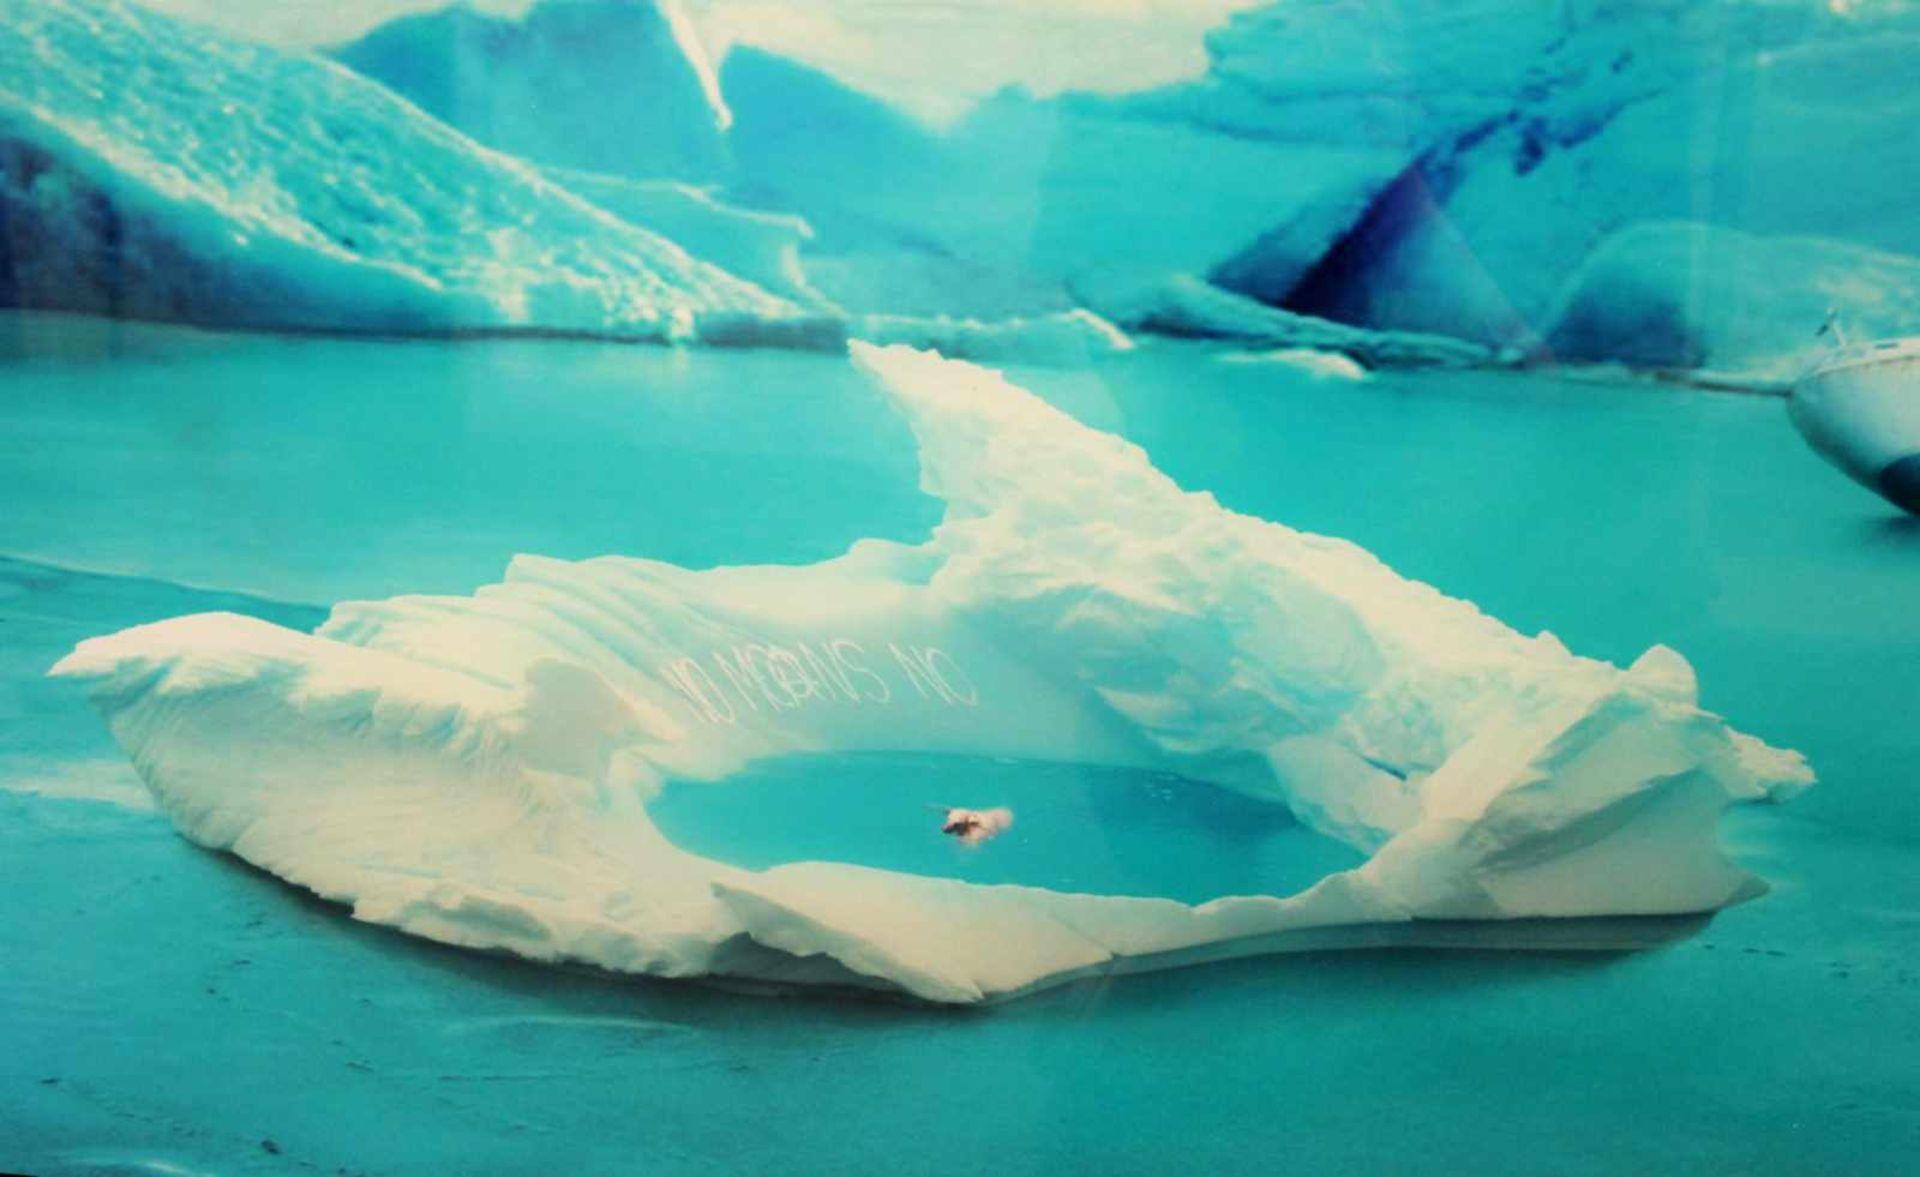 Helmut Grill geb. 1965 The Frozen Discoverer 2011 Fotografie hinter Acrylglas signiert, betitelt, - Bild 4 aus 4